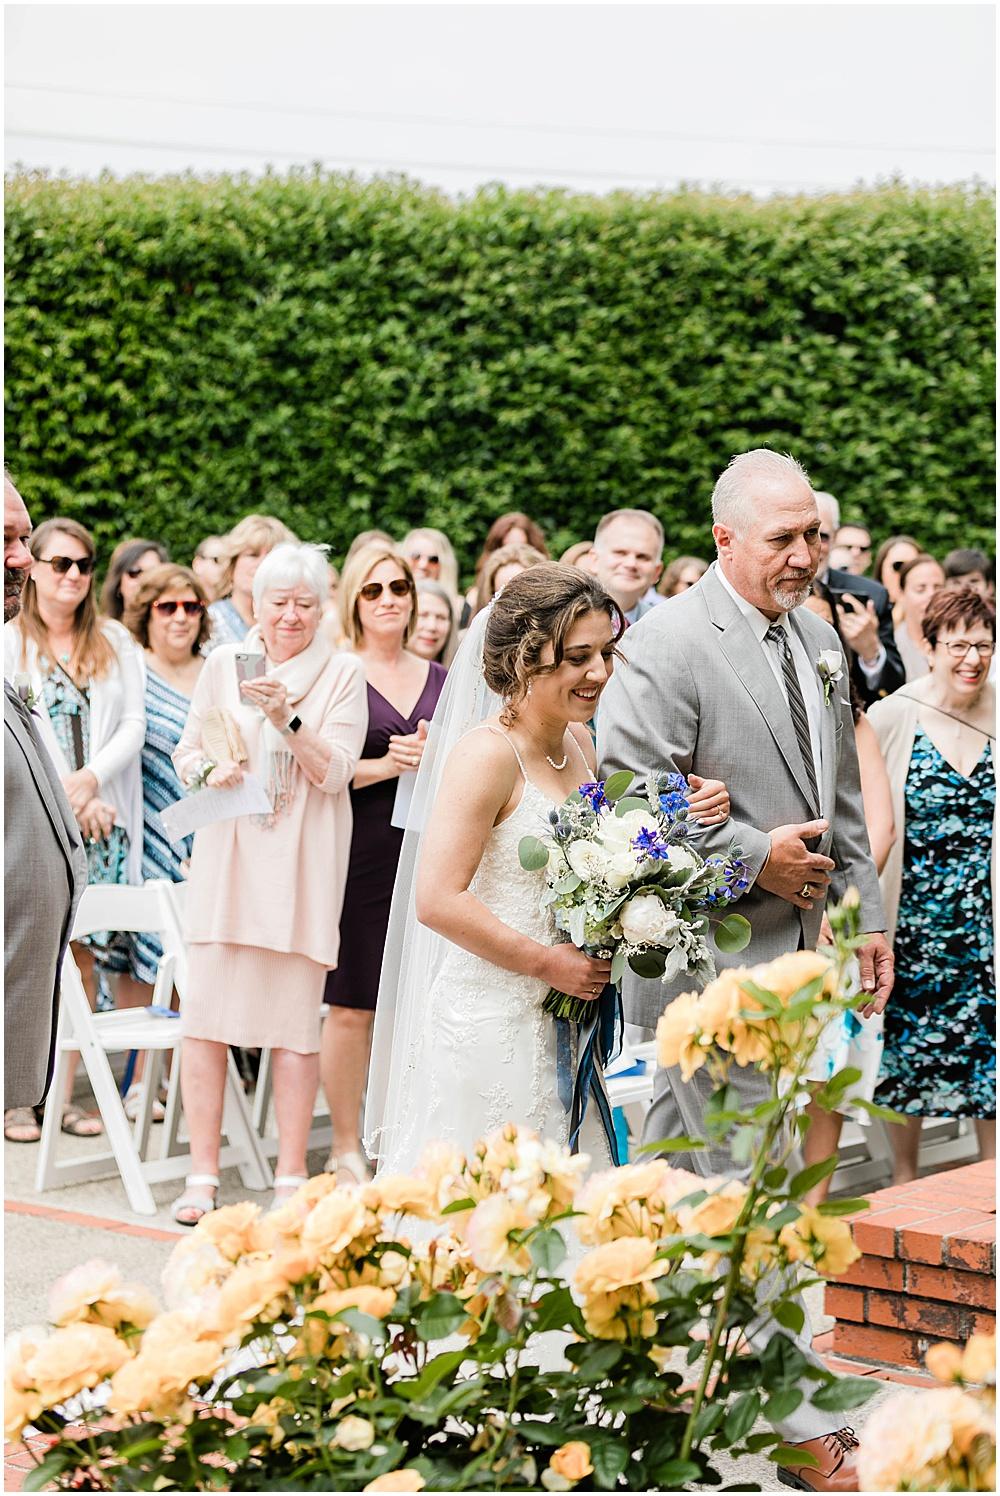 Samantha McPherrin Photography-Chico Wedding Photographer_0039.jpg